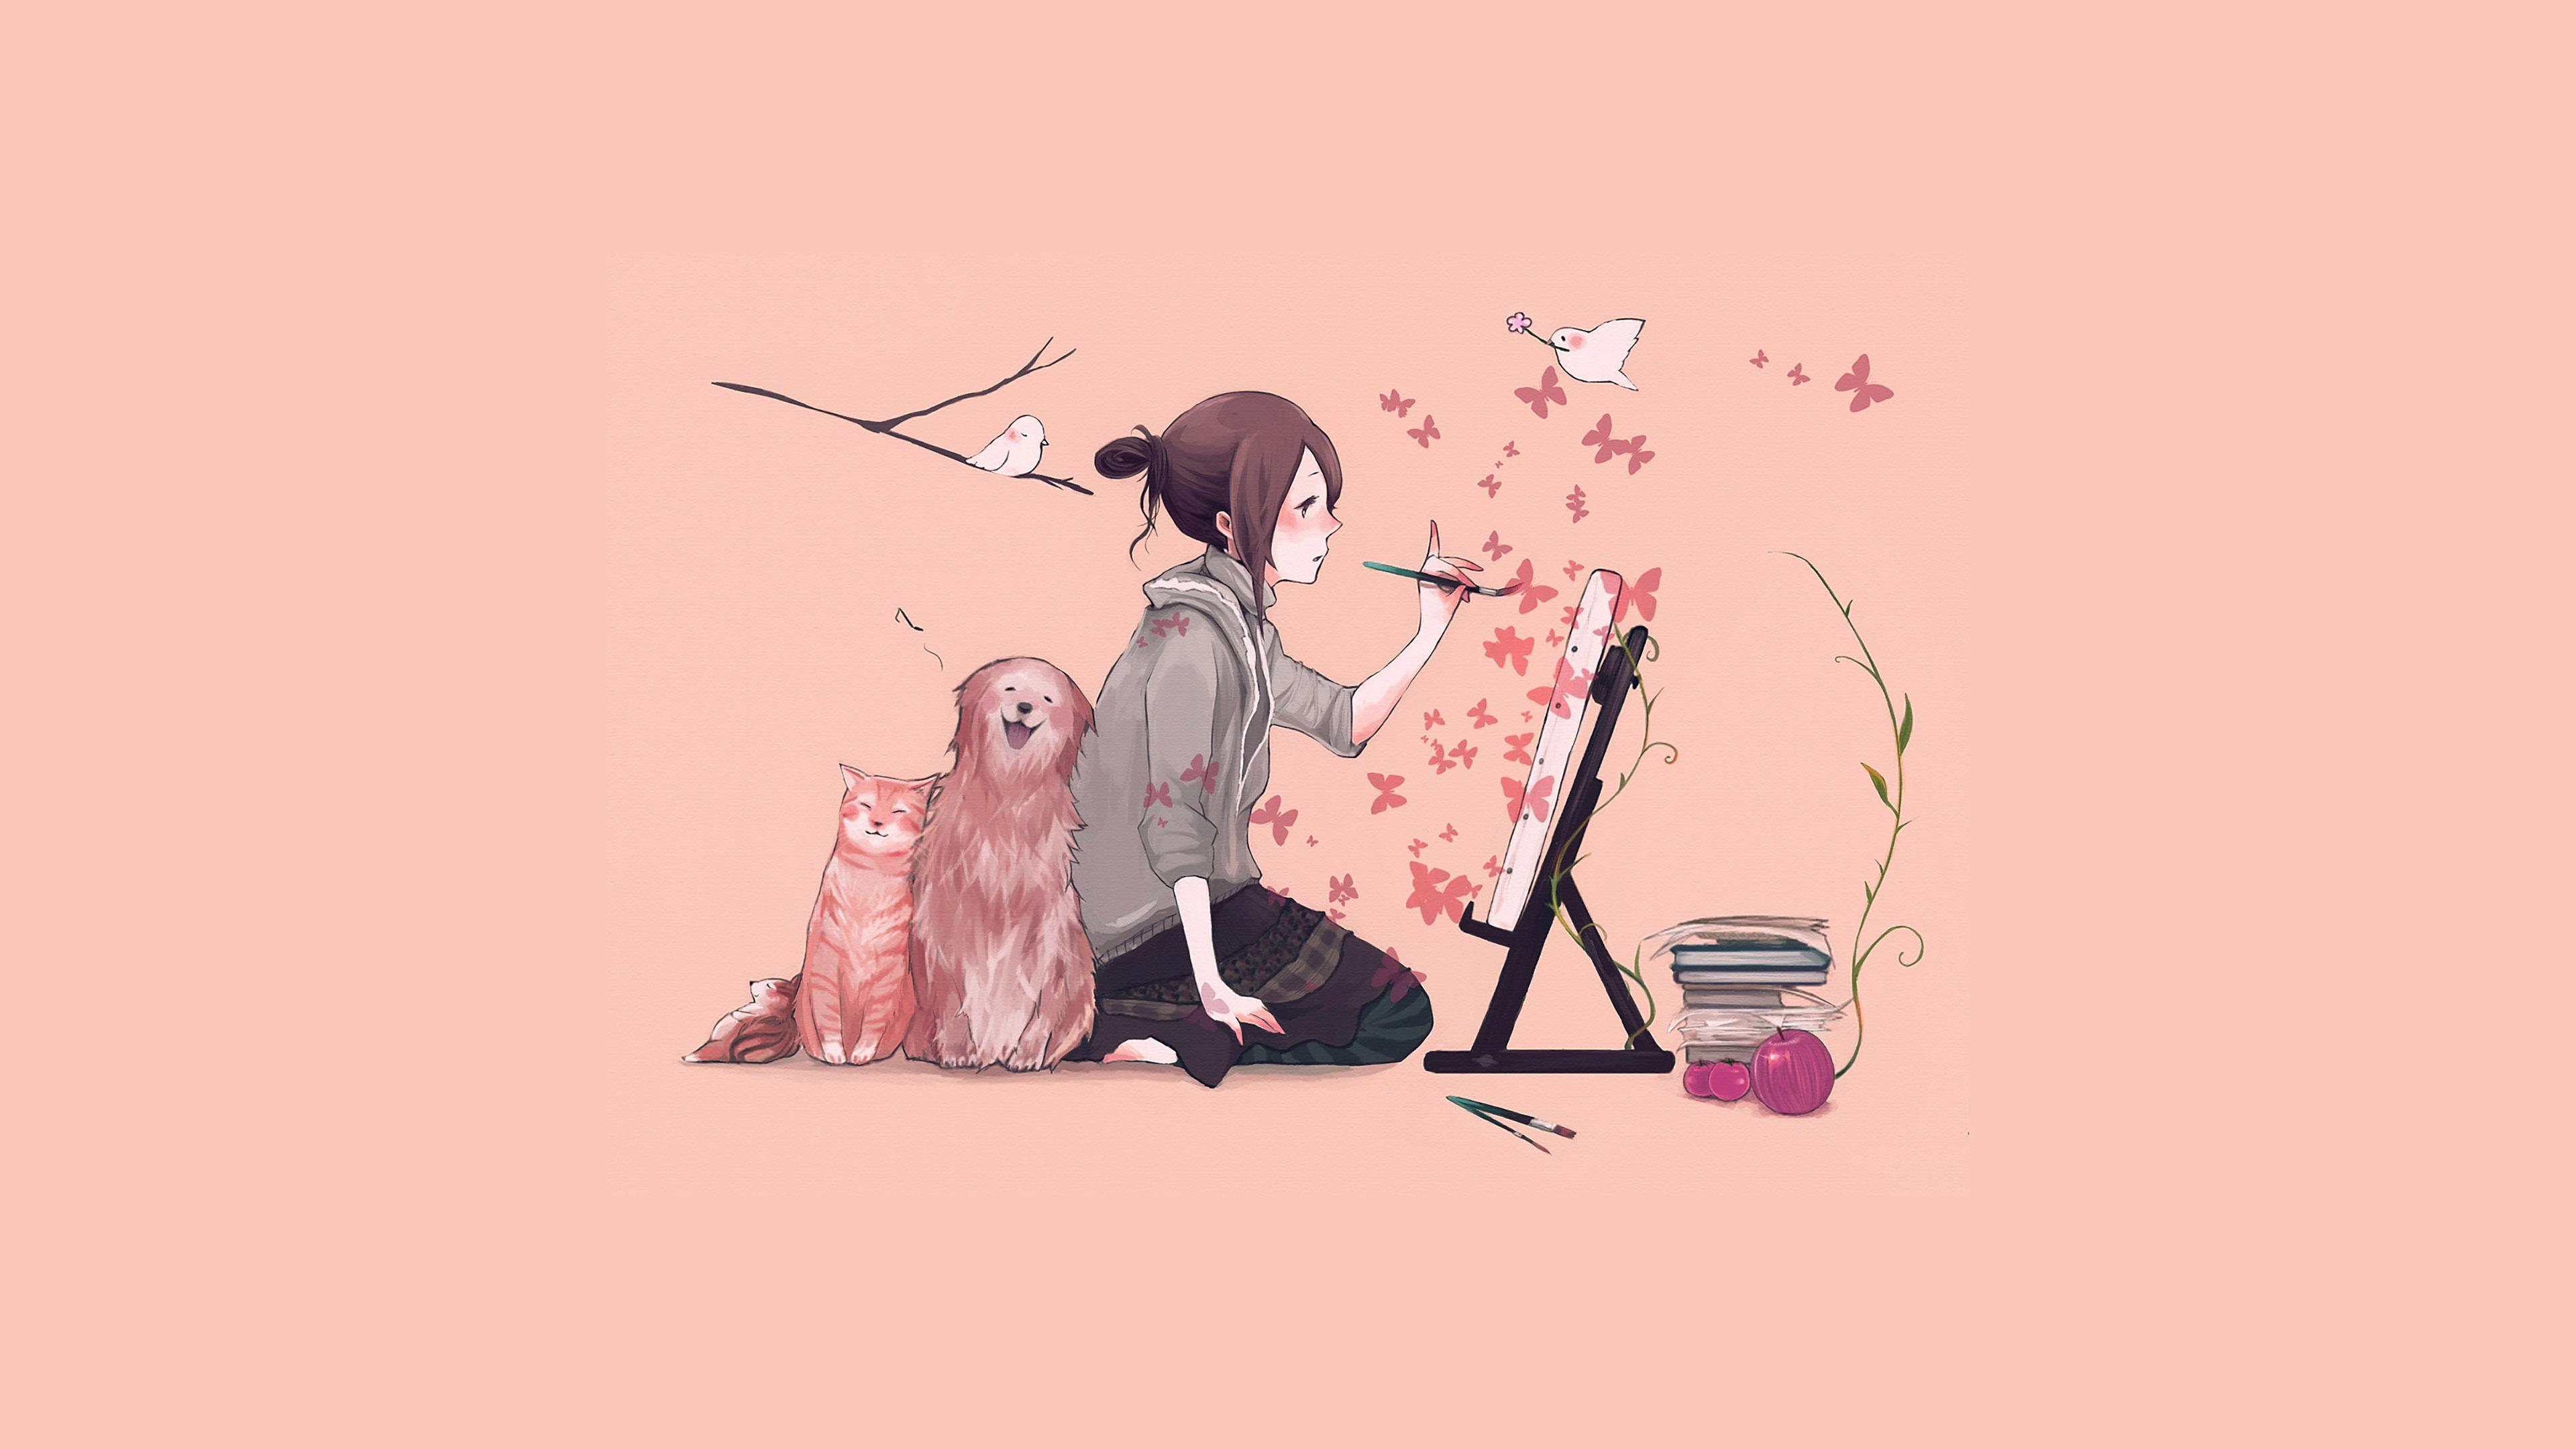 Dark Fall Iphone Wallpaper Aj49 Illustrator Dog Cat Pink Art Illust Wallpaper